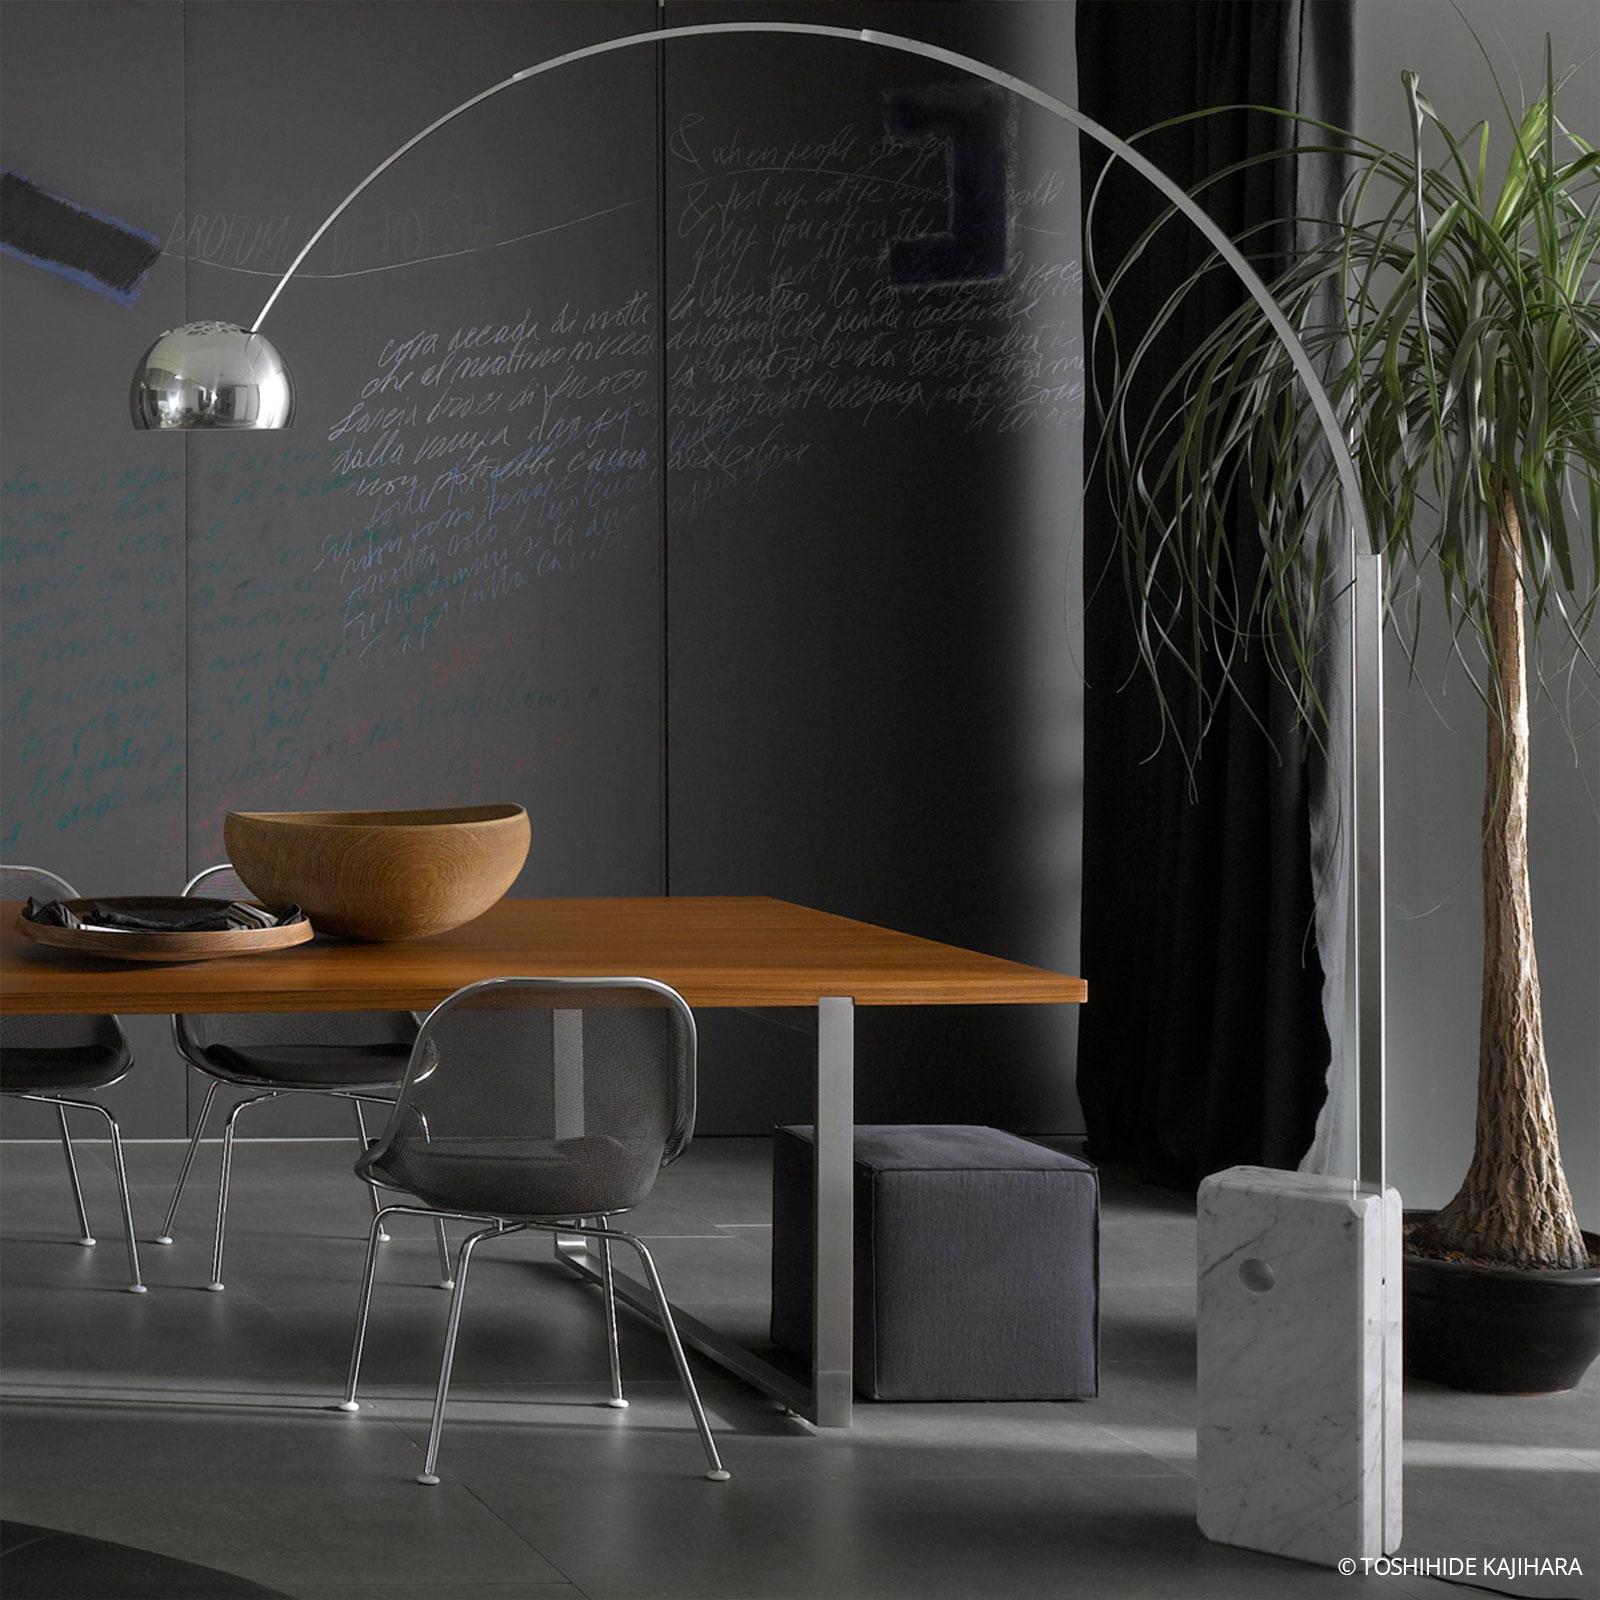 Hoogwaardige design-booglamp ARCO